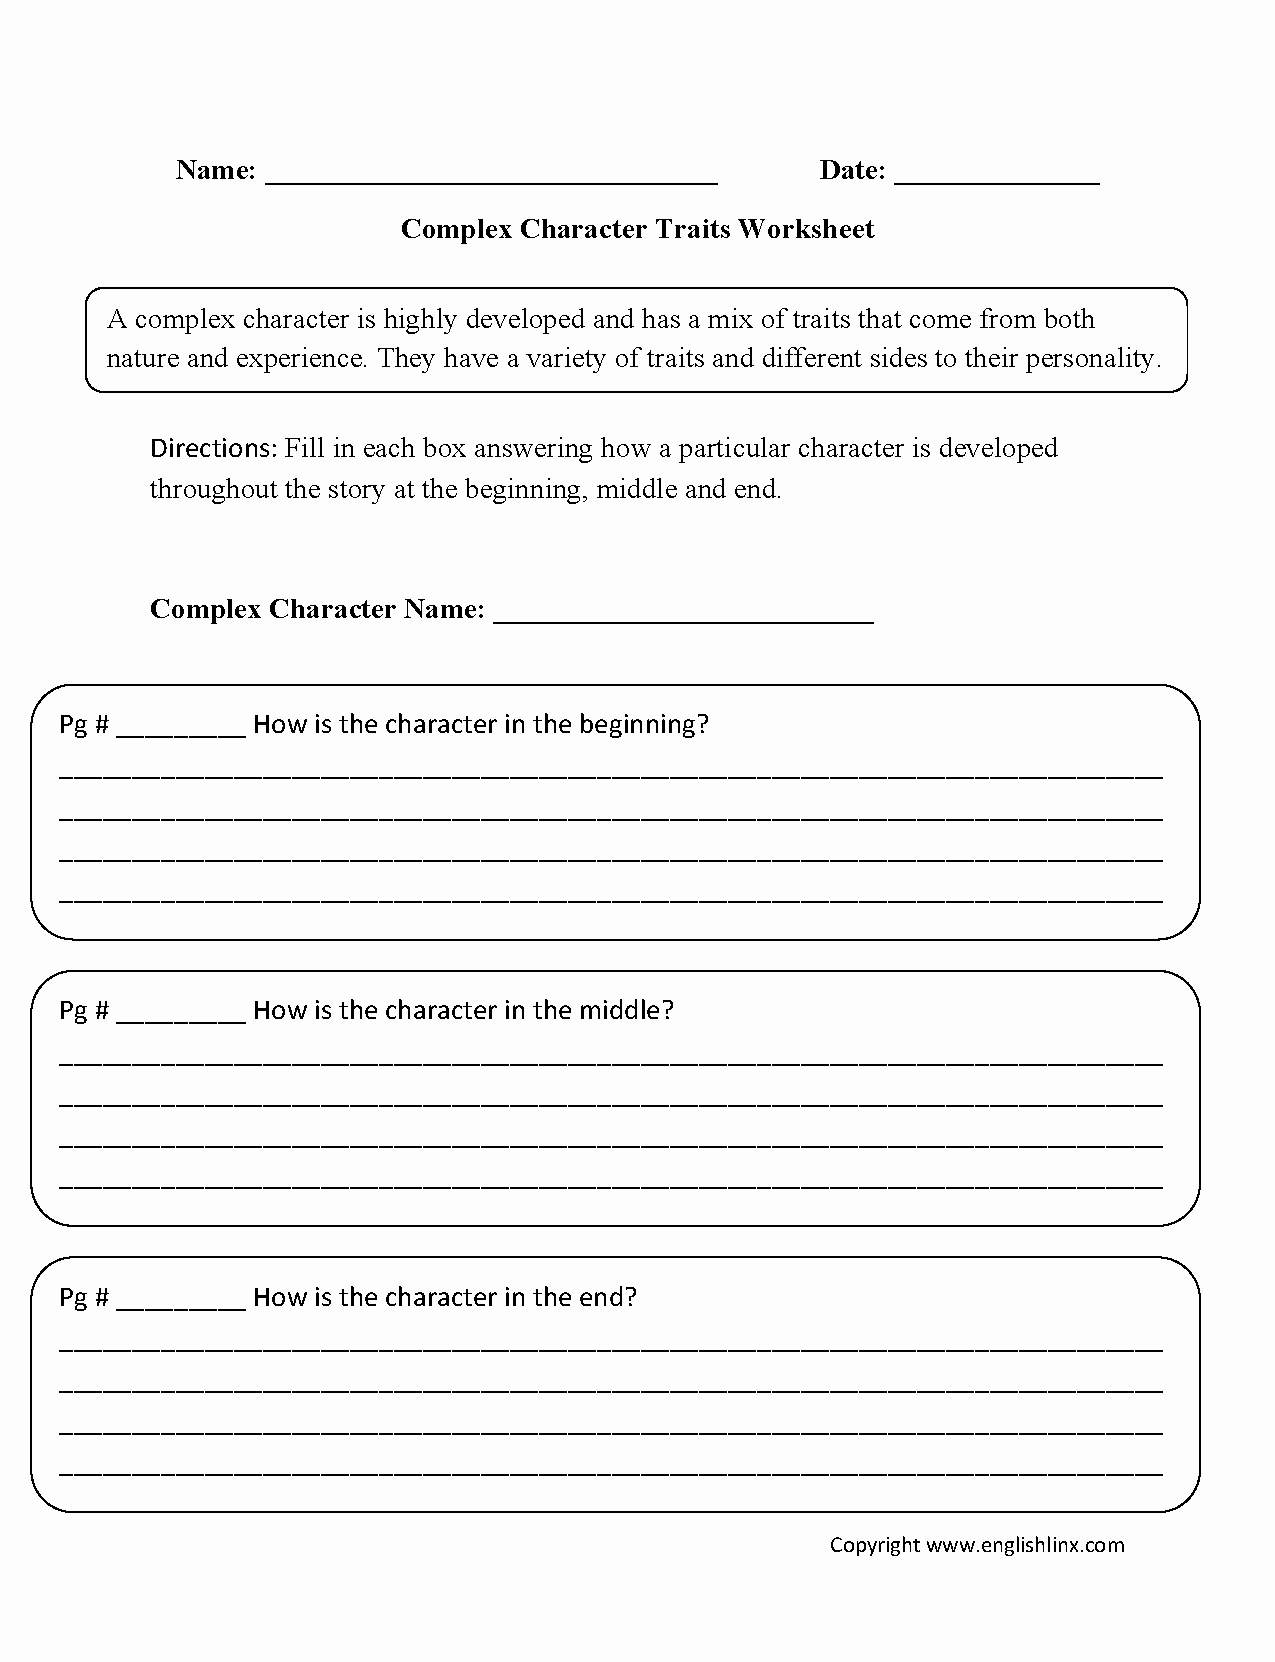 Identifying Character Traits Worksheet Elegant Inferring Character Feelings Worksheet